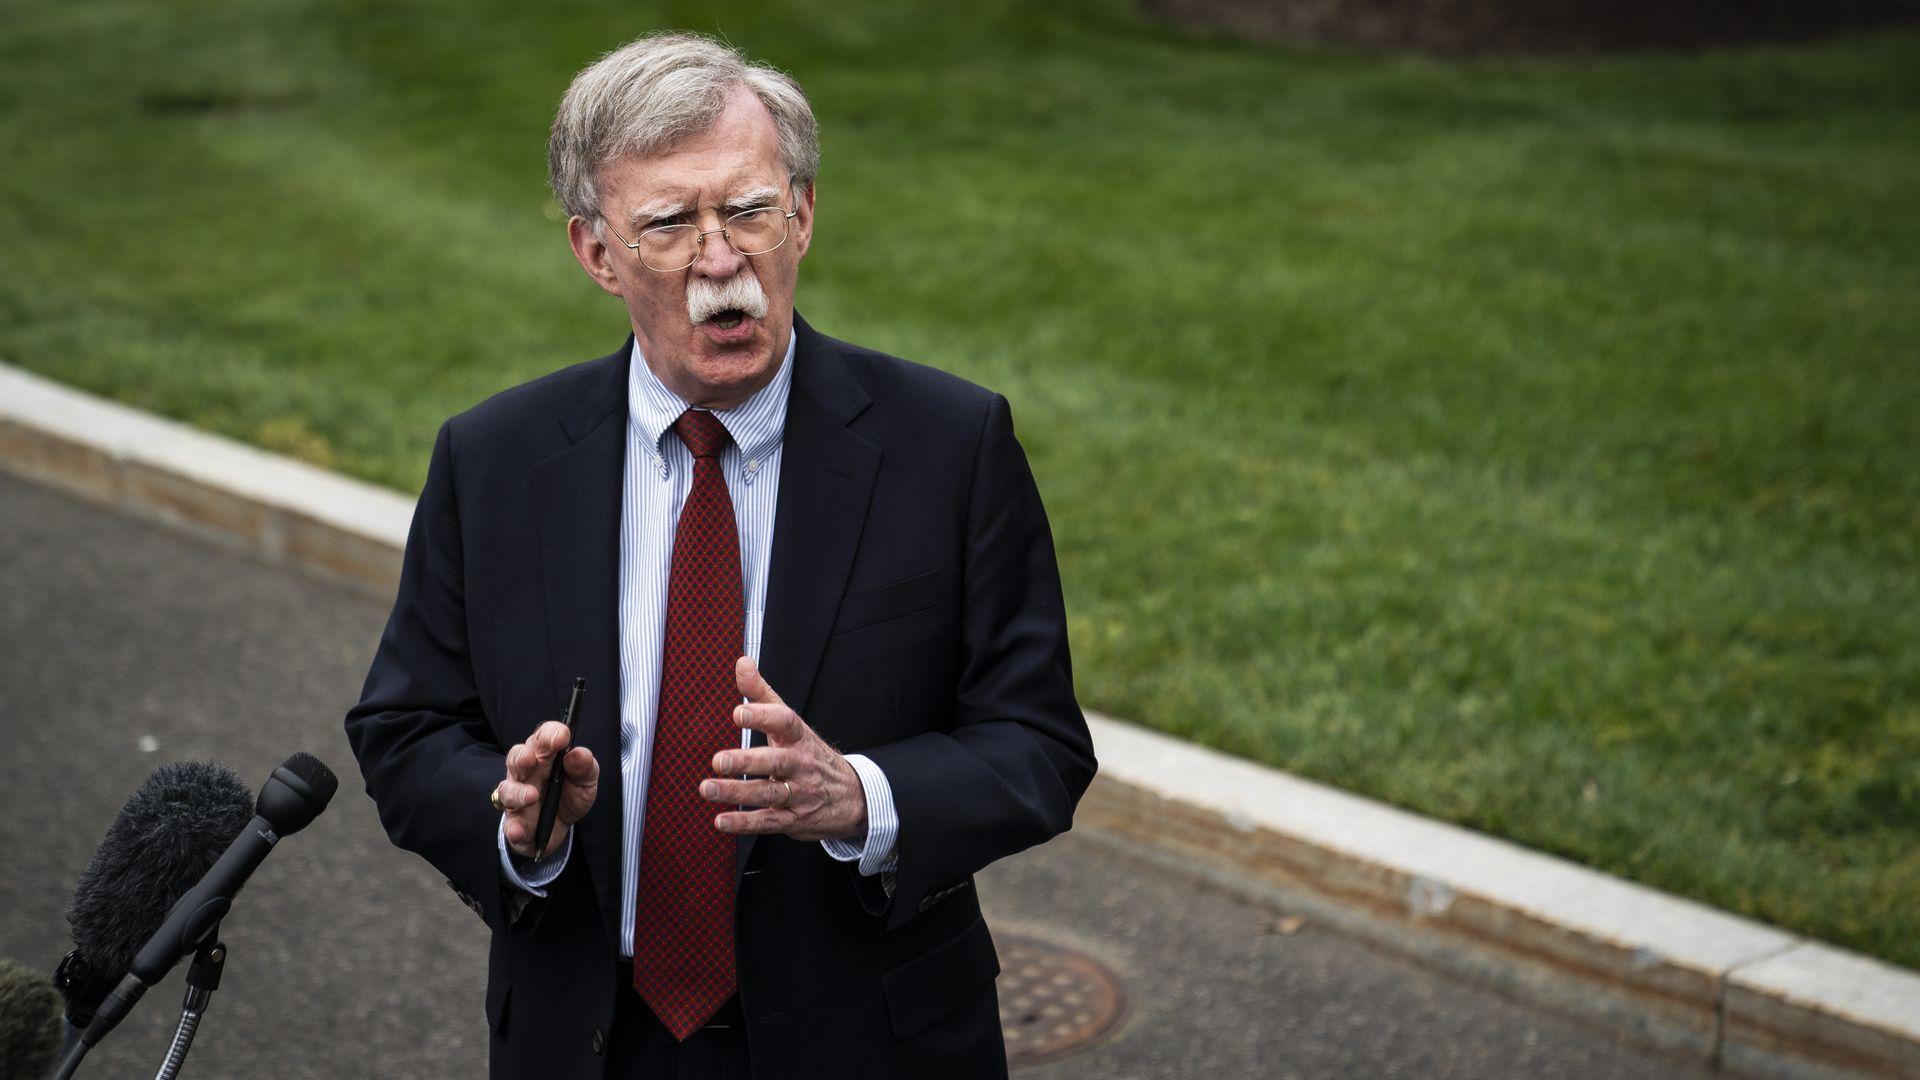 John Bolton speaking to press outside the White House